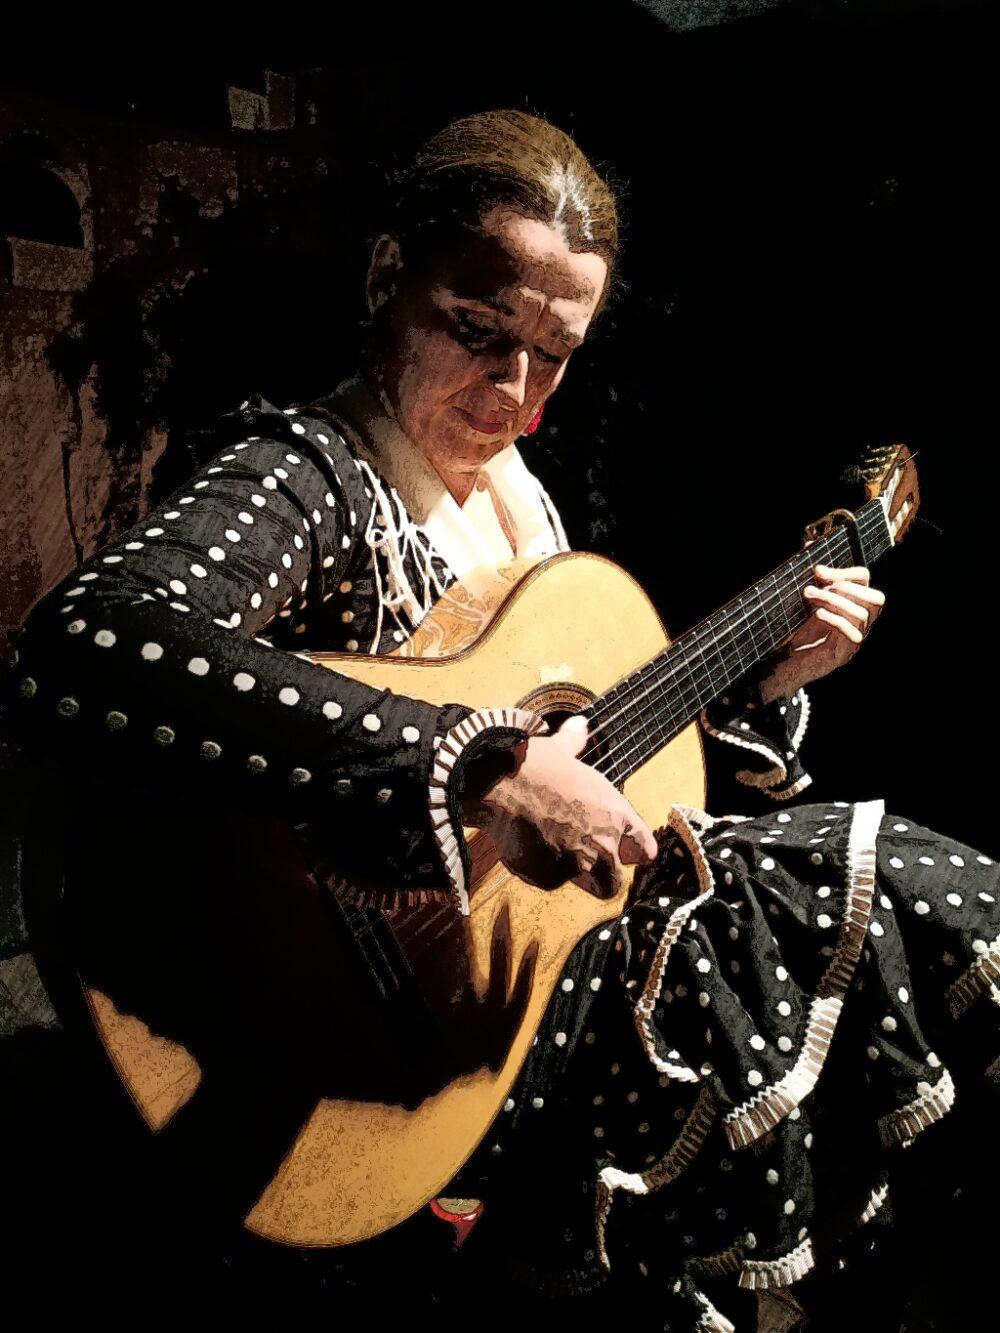 Celia Morales